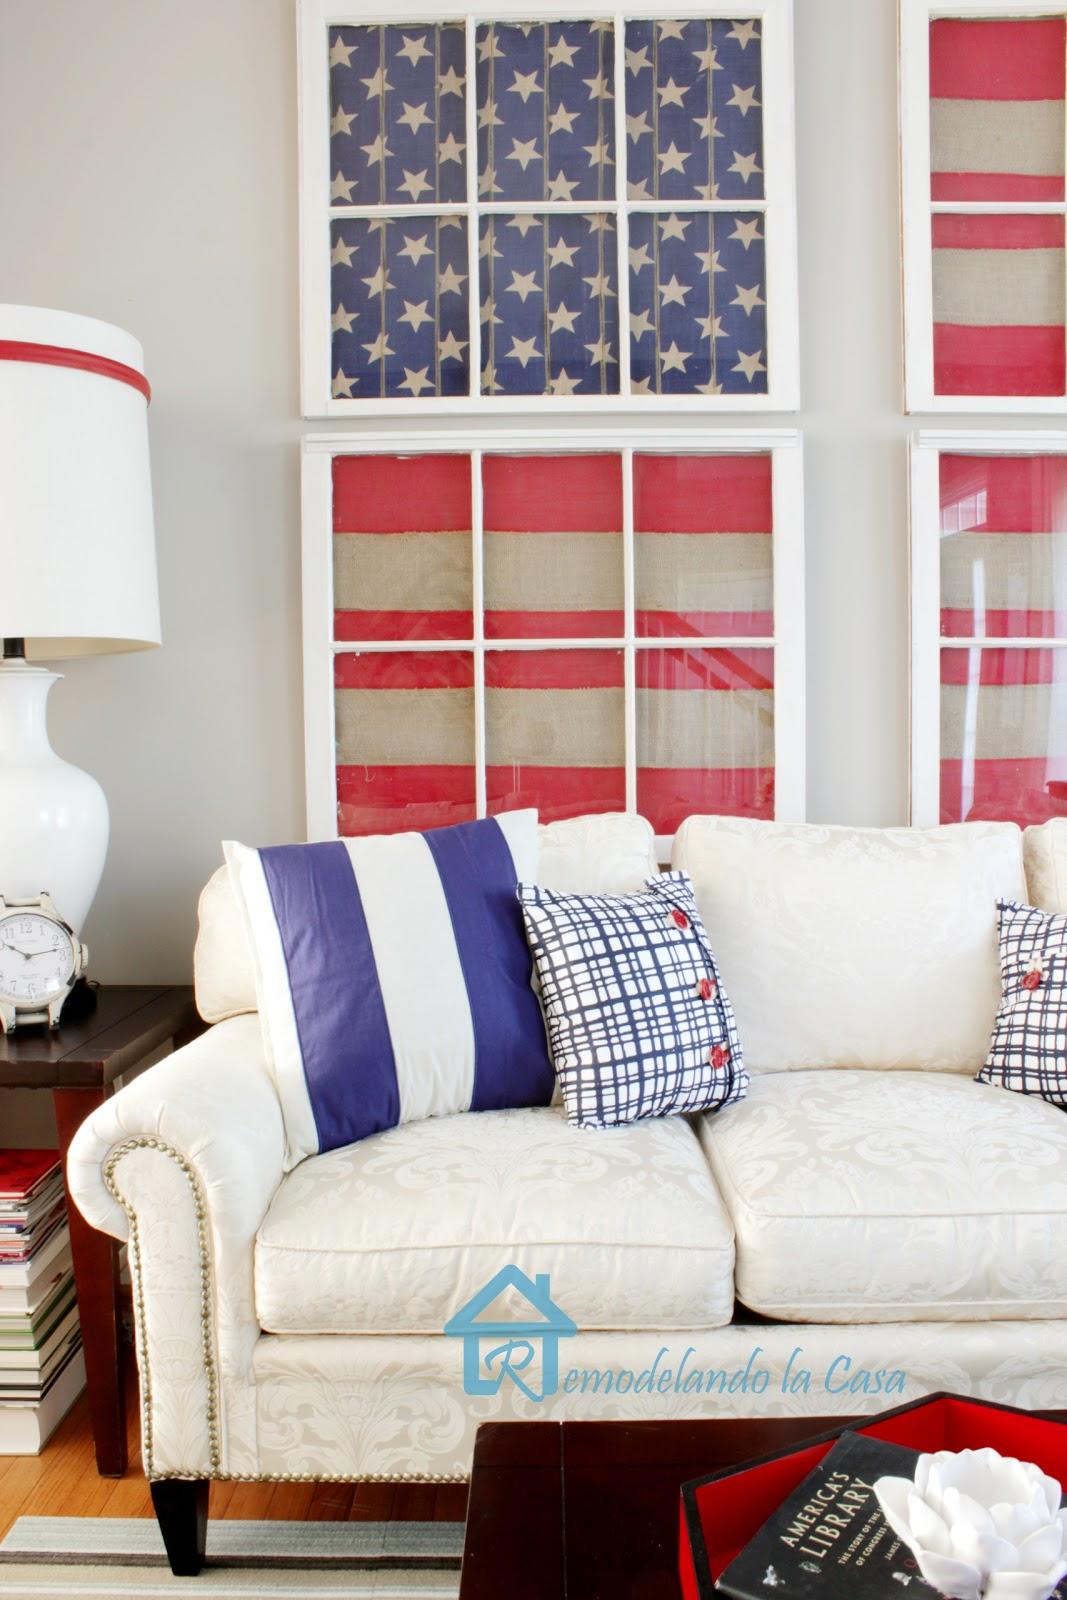 Remodelando la Casa: Red, White and Blue Living Room